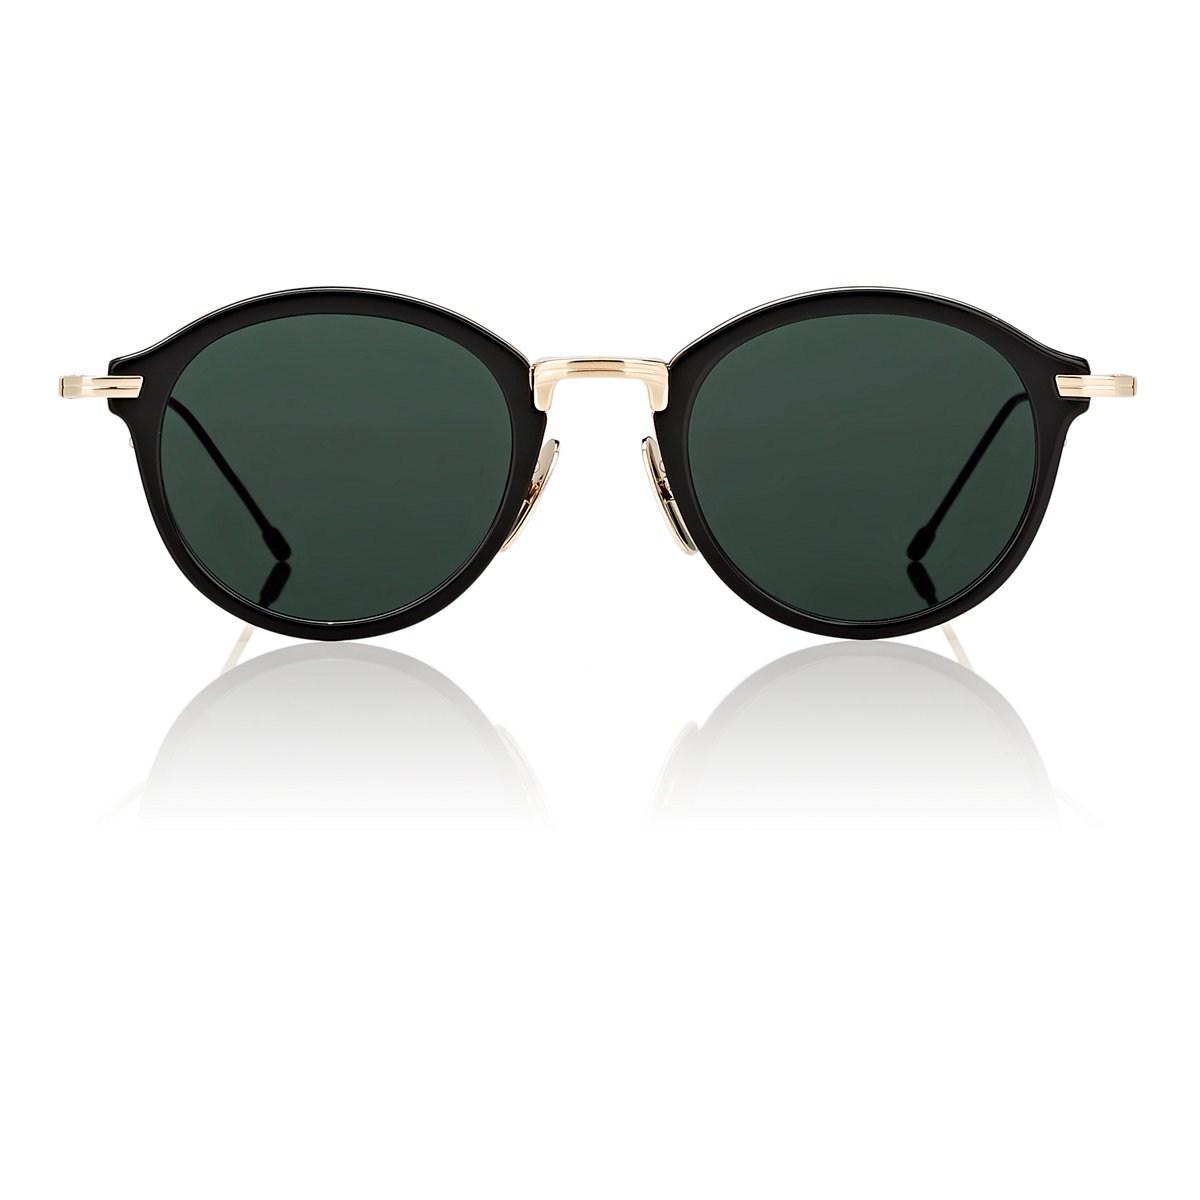 647af9342f14 Thom Browne. Men s Black Tb-908 Sunglasses.  650 From Barneys New York